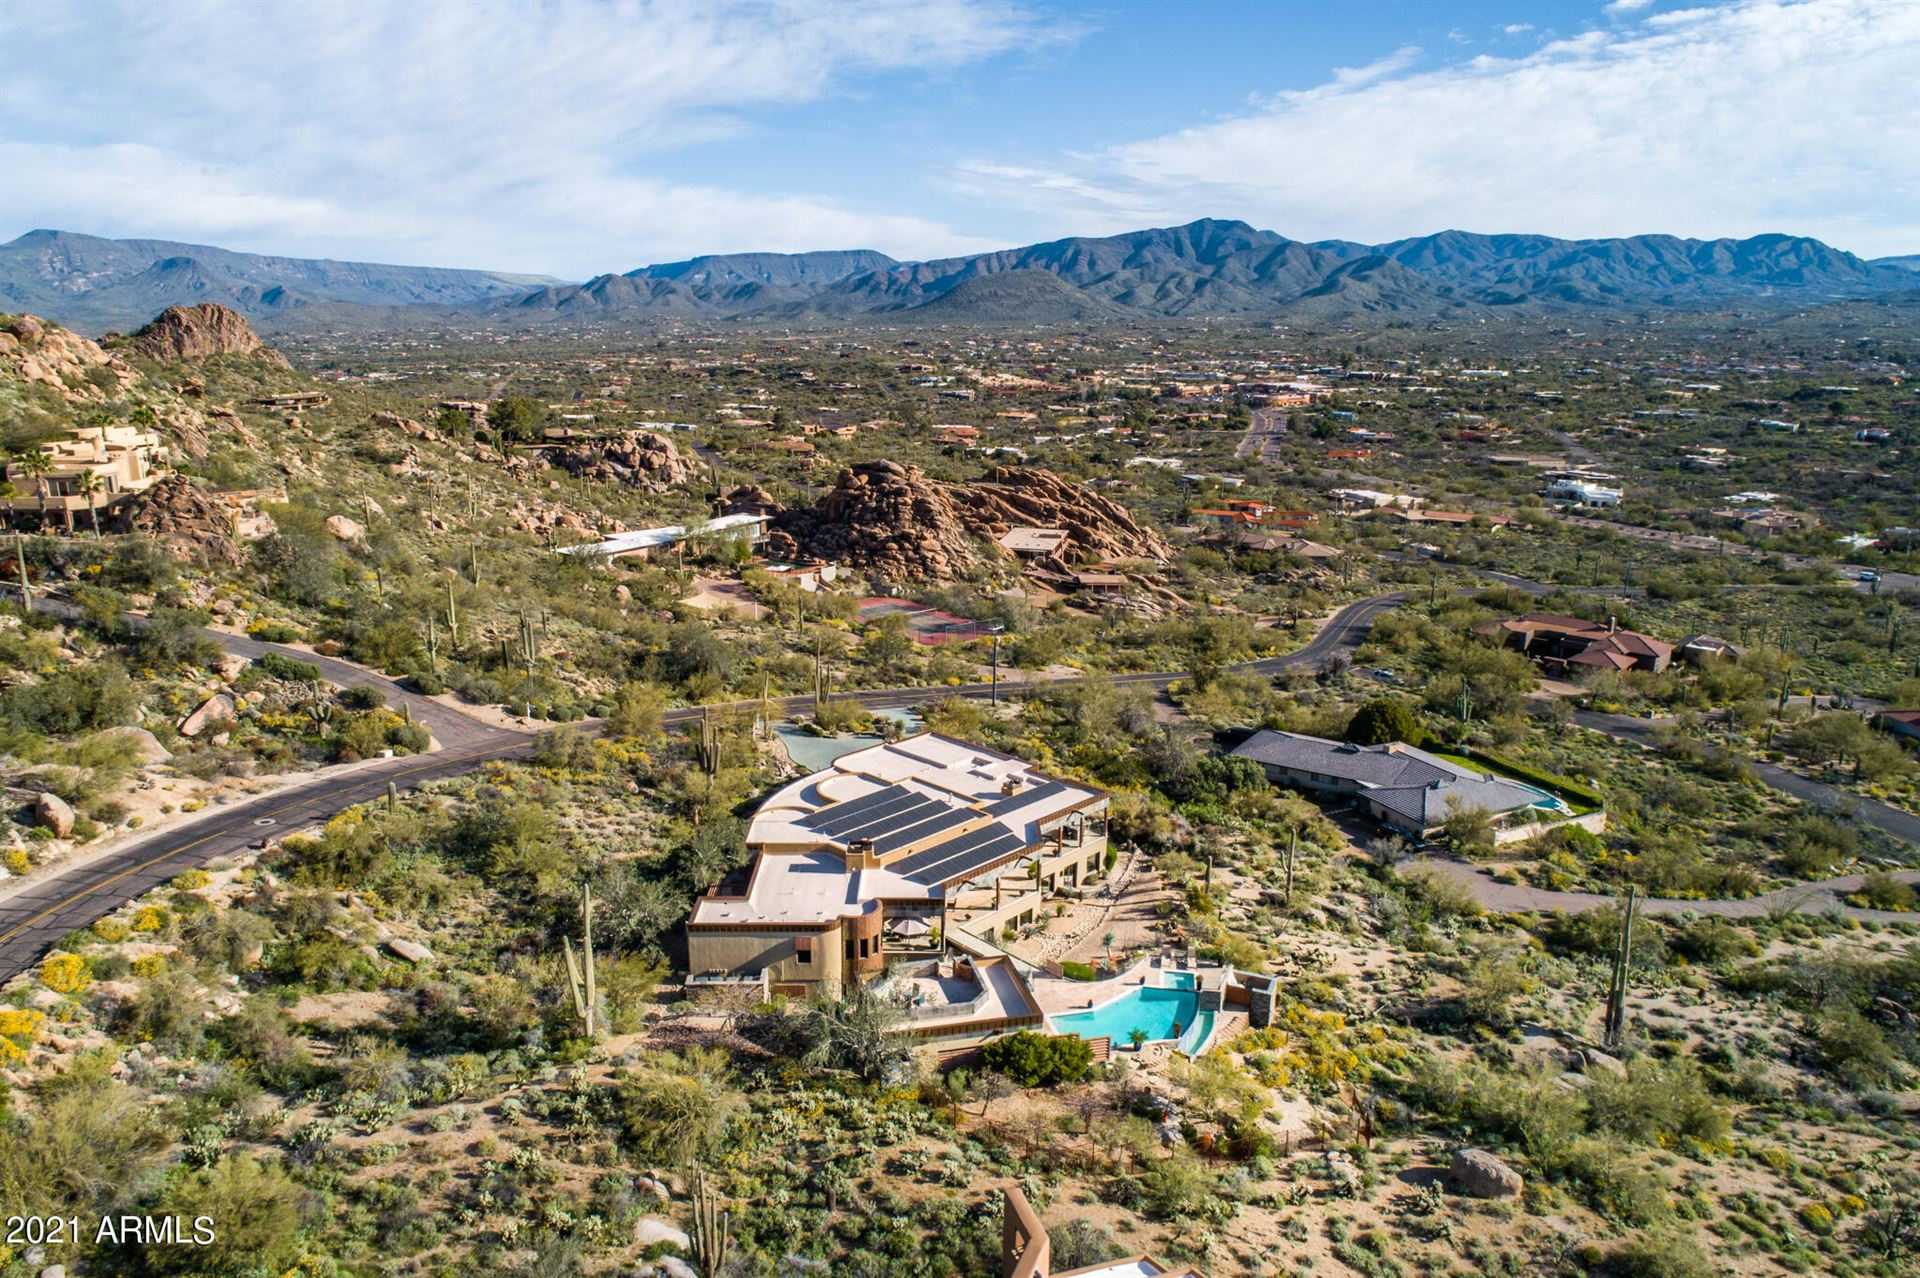 Photo of 7055 E STAGECOACH PASS --, Carefree, AZ 85377 (MLS # 6258240)